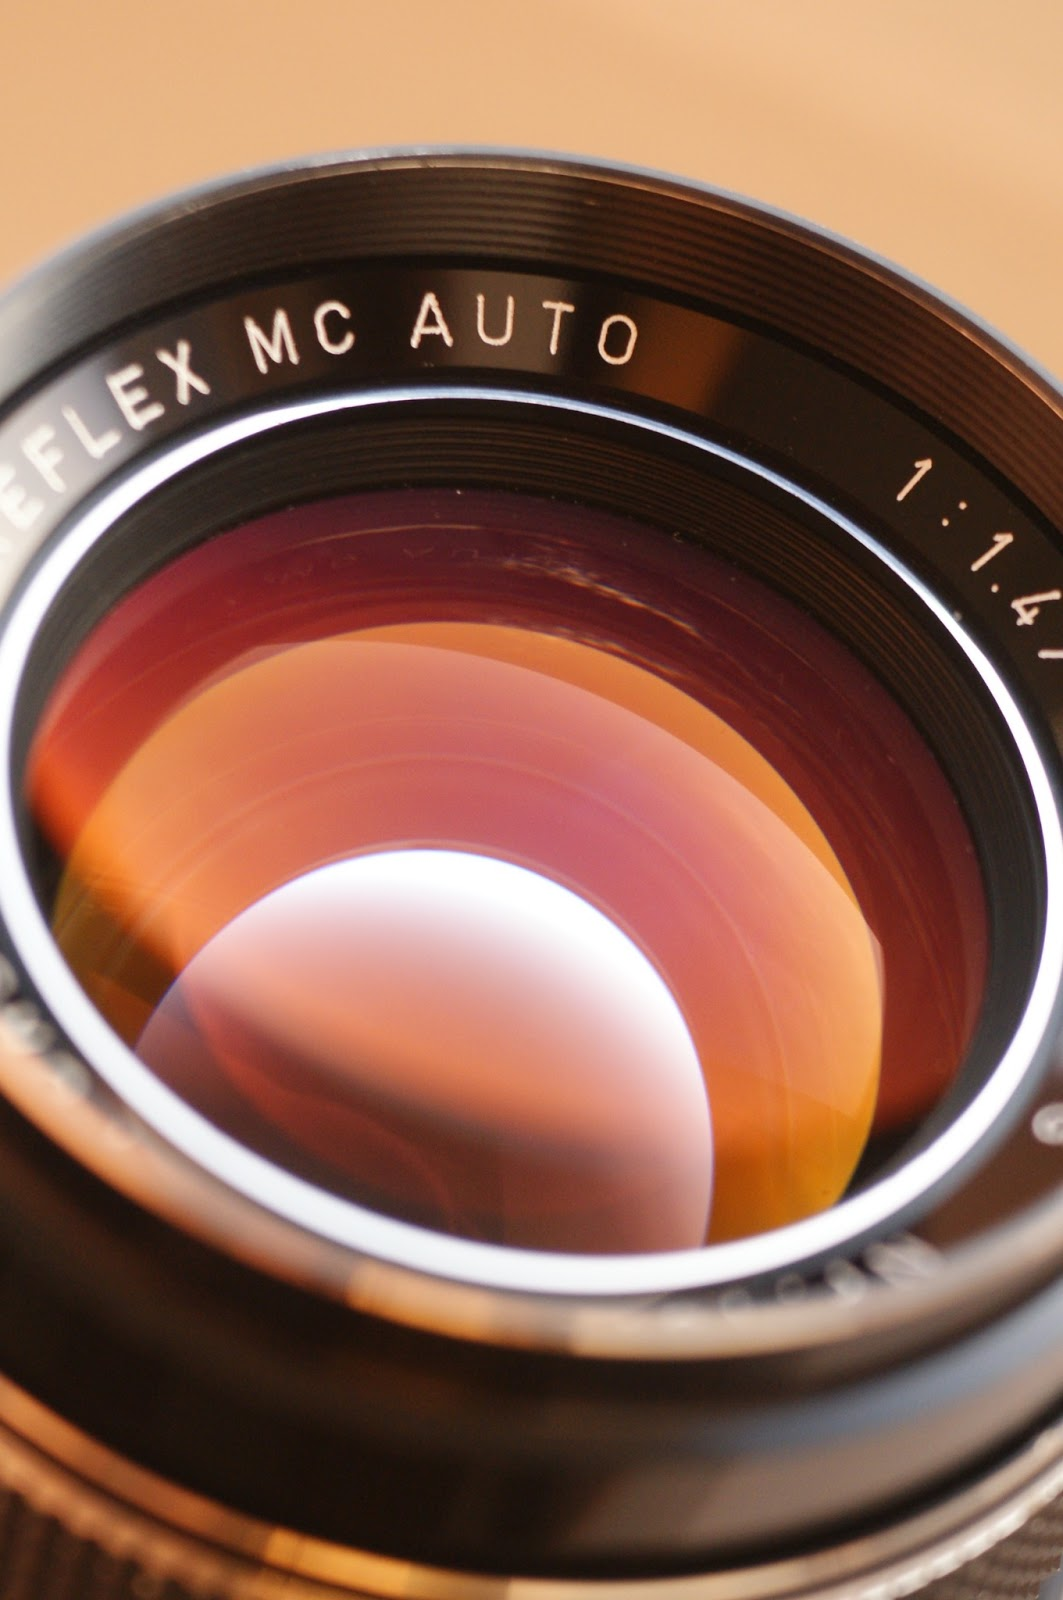 Porst Color Reflex MC Auto 1.4/55 sample